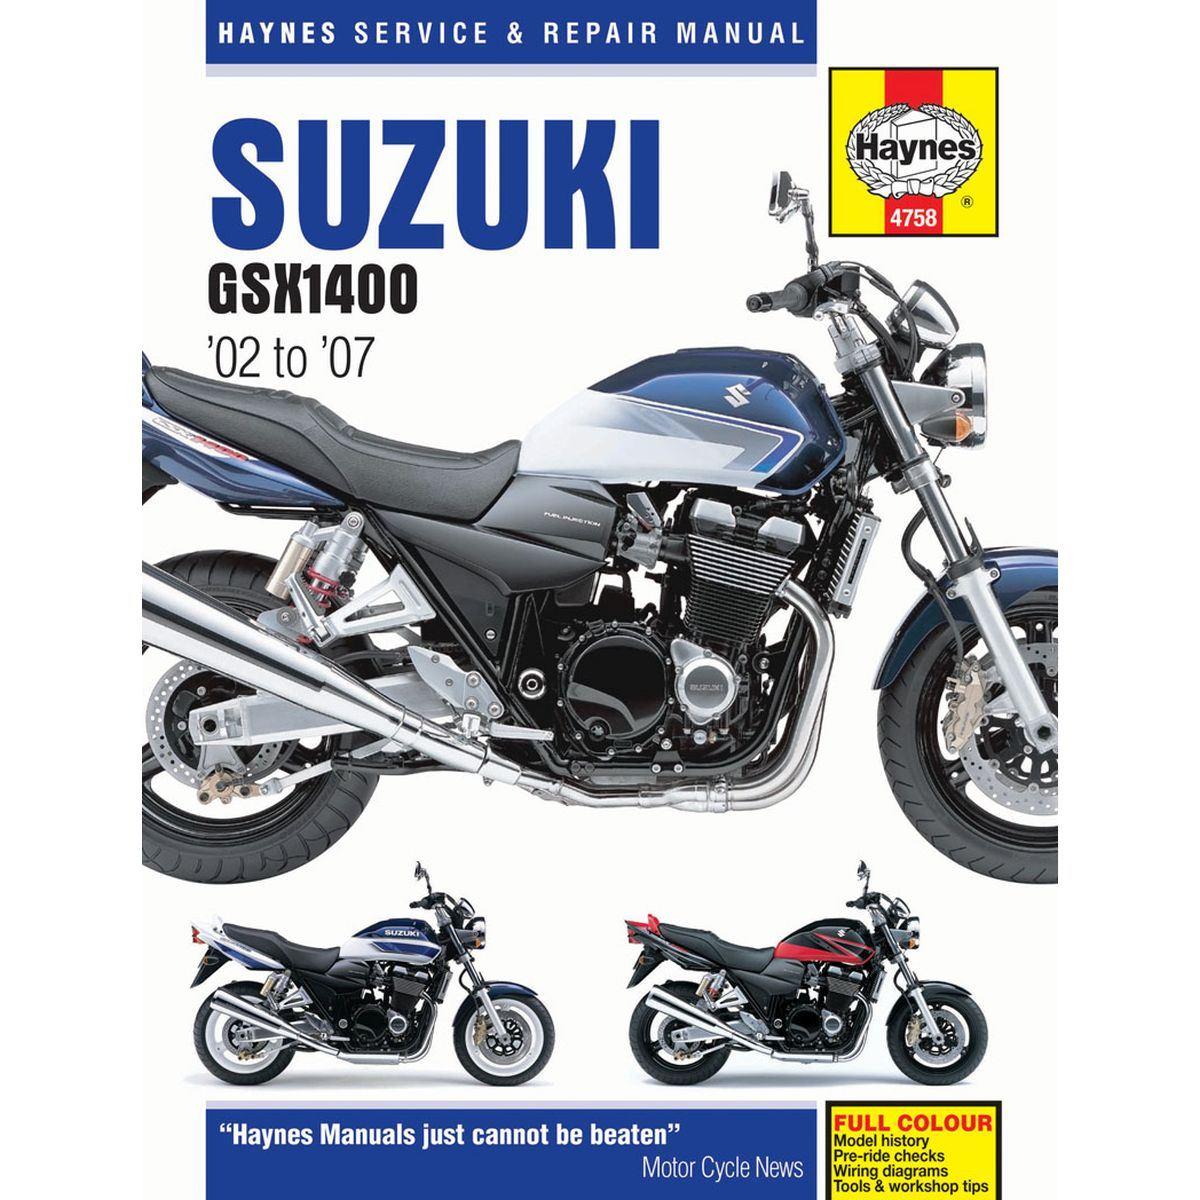 Image is loading Manual-Haynes-for-2007-Suzuki-GSX-1400-K7-